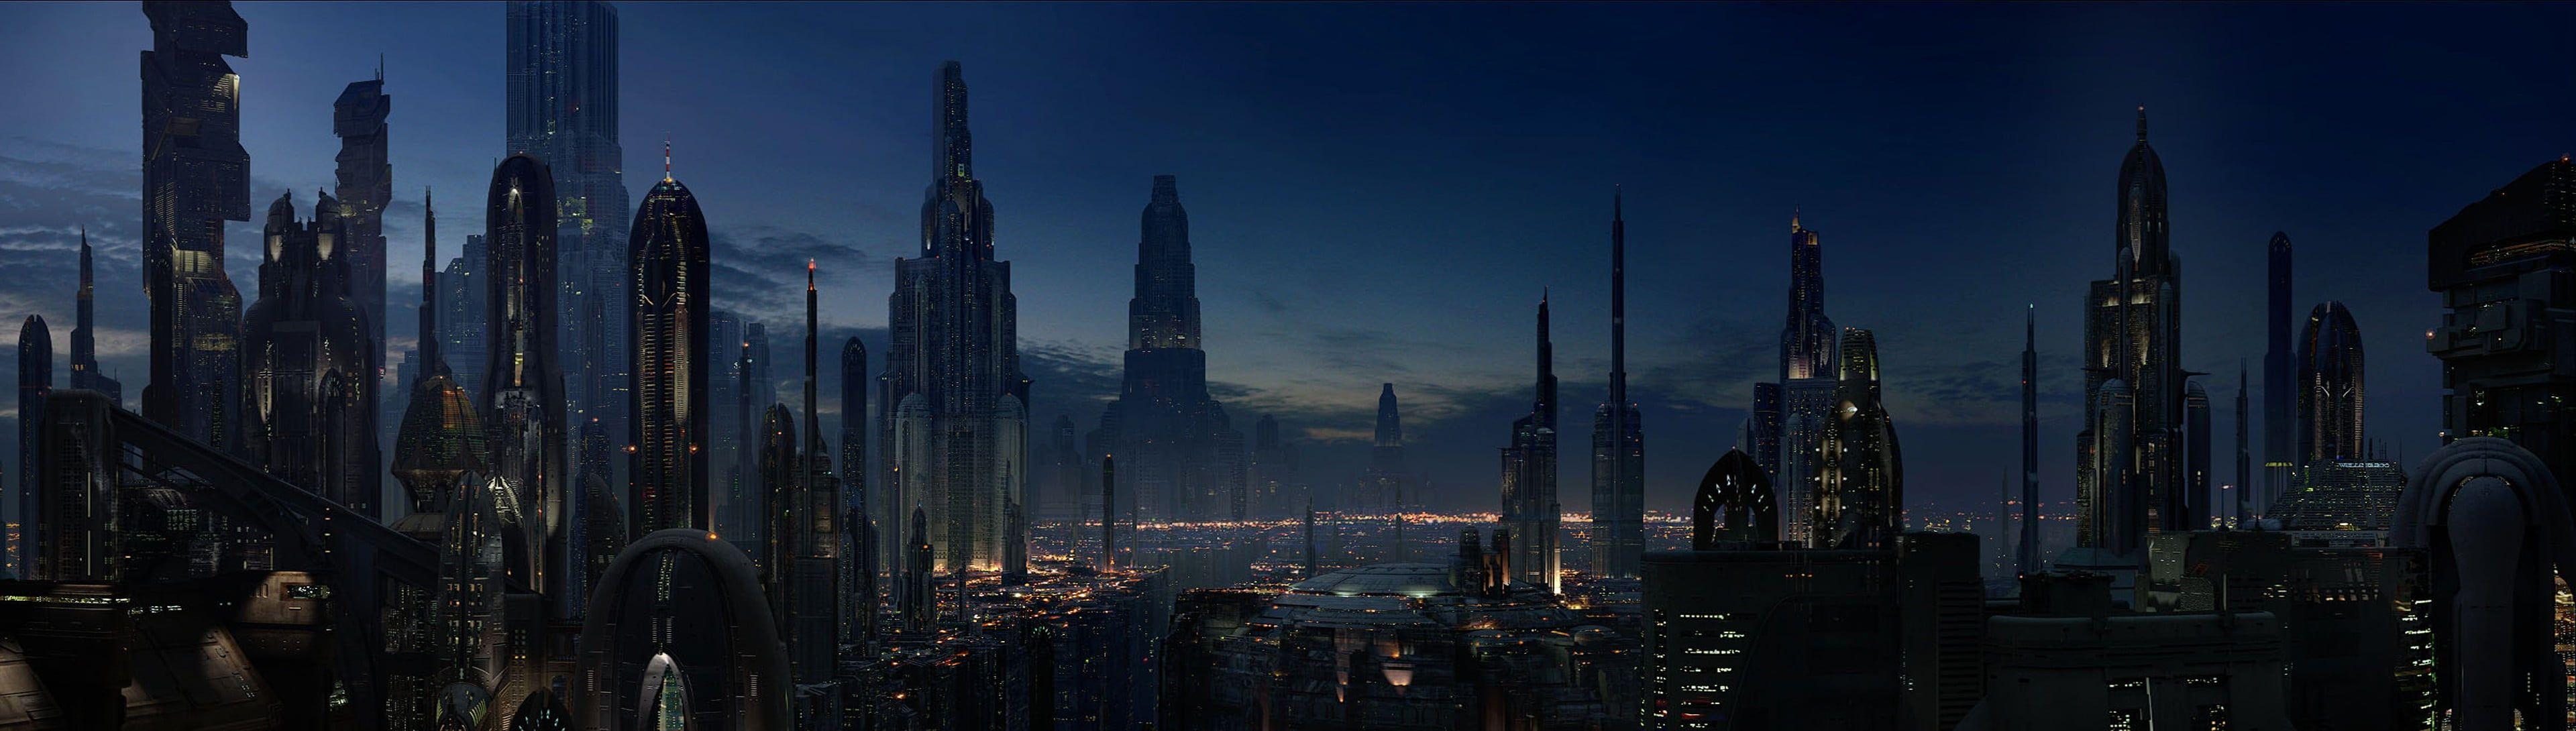 city wallpaper multiple display Star Wars #Coruscant #4K # ...